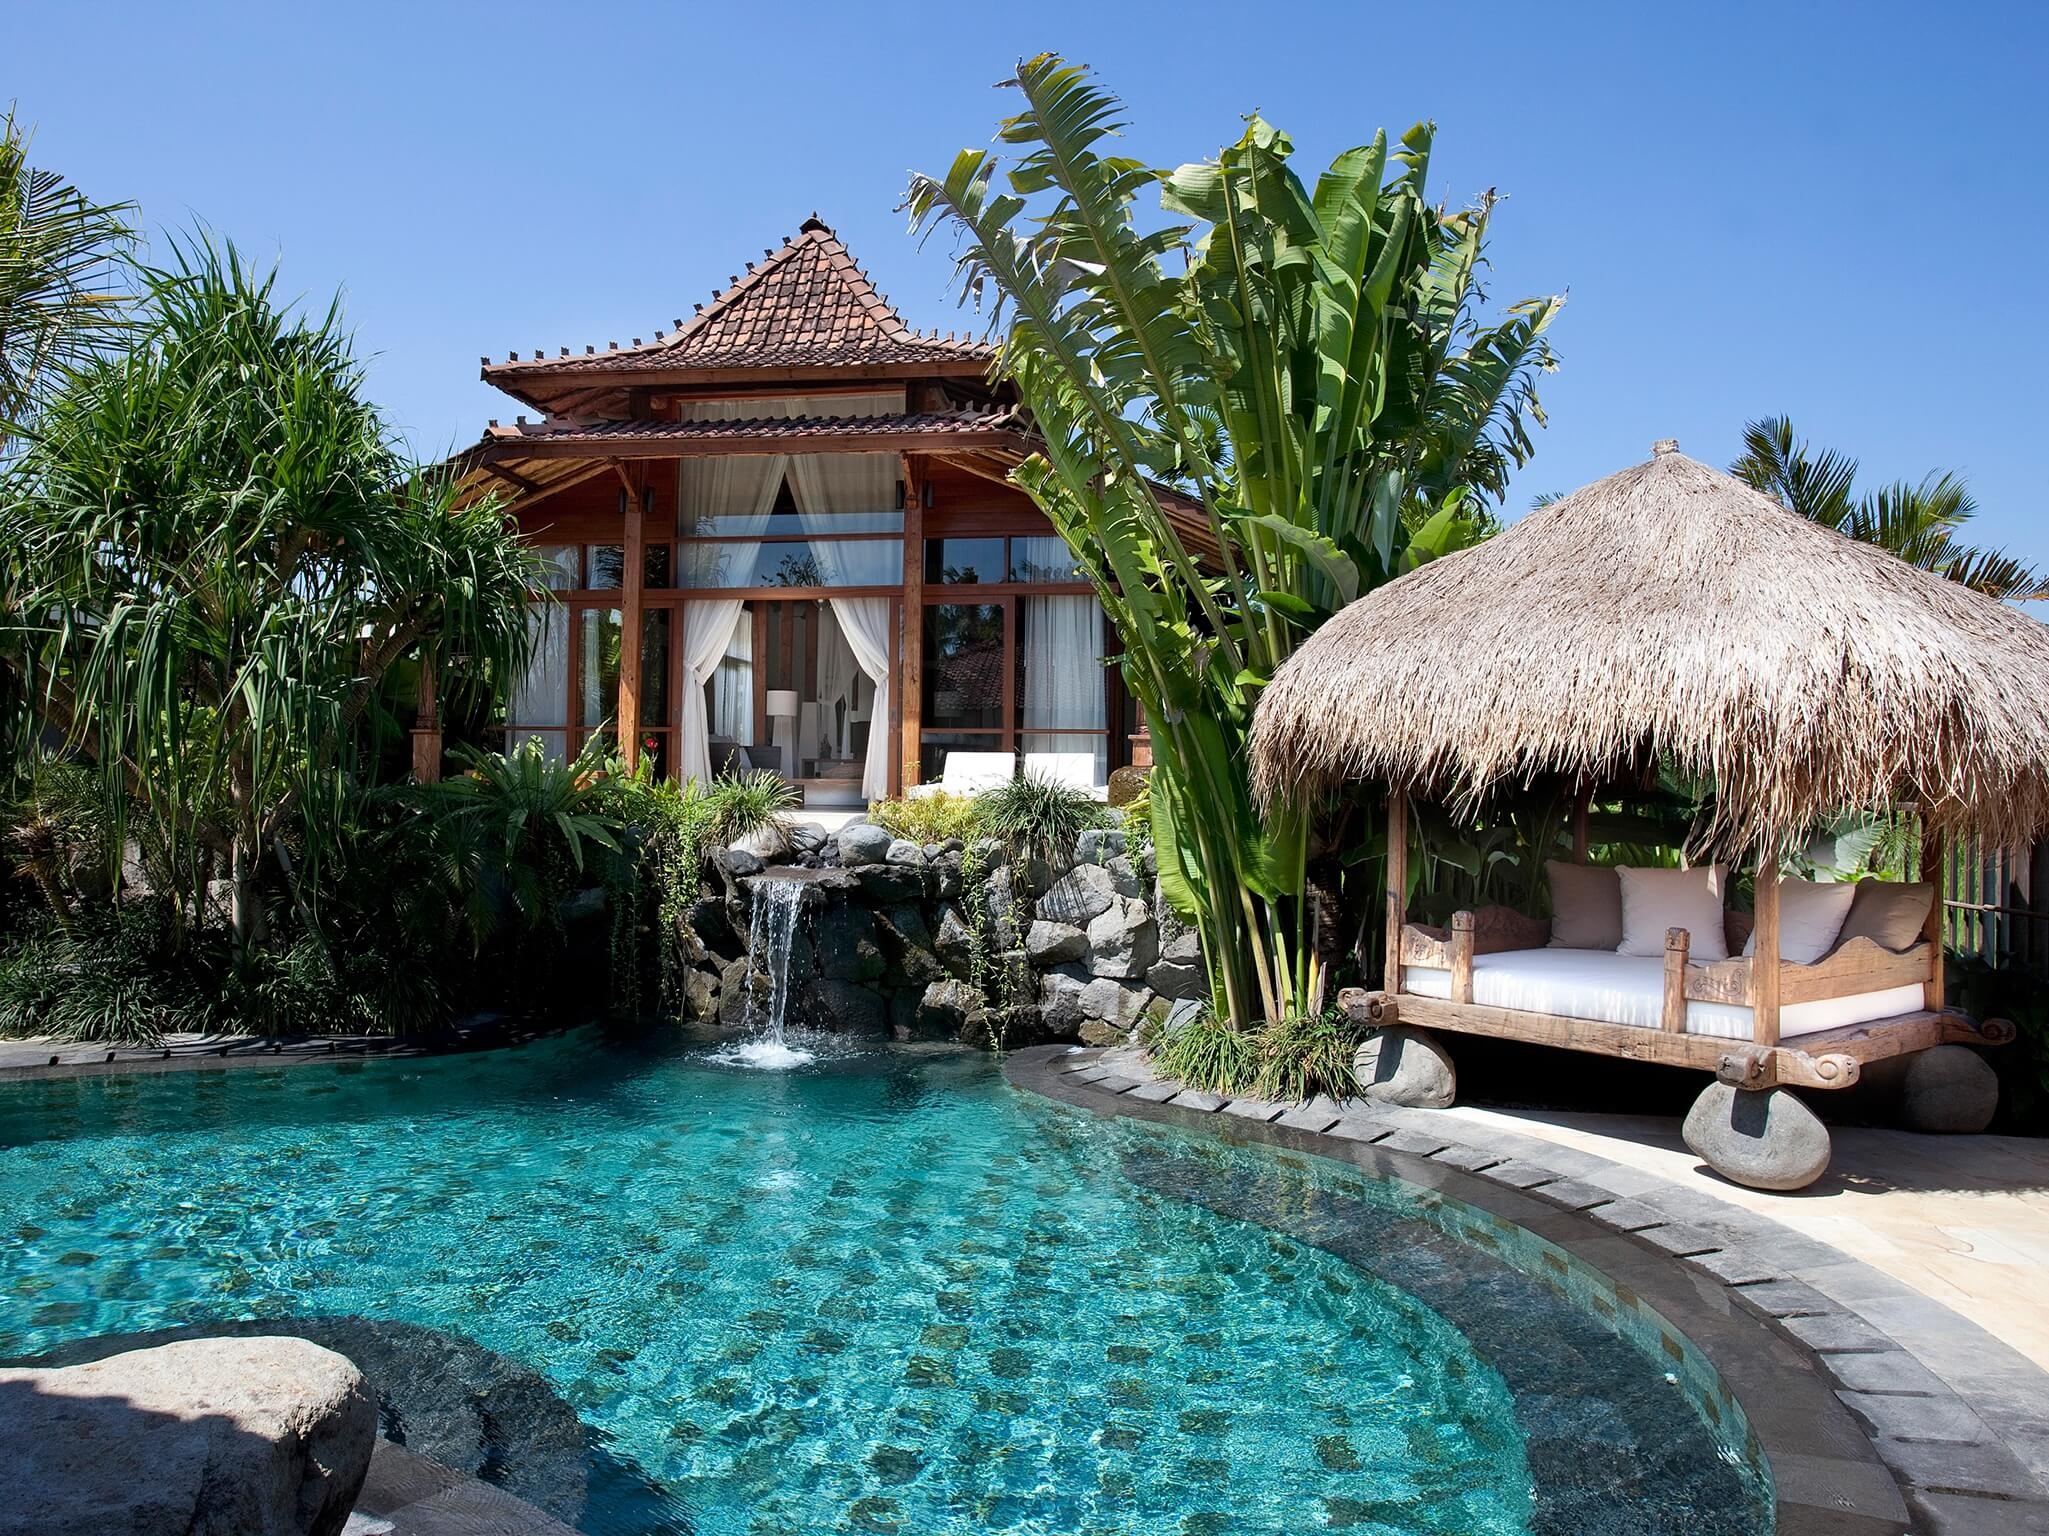 Amy Villa in Bali